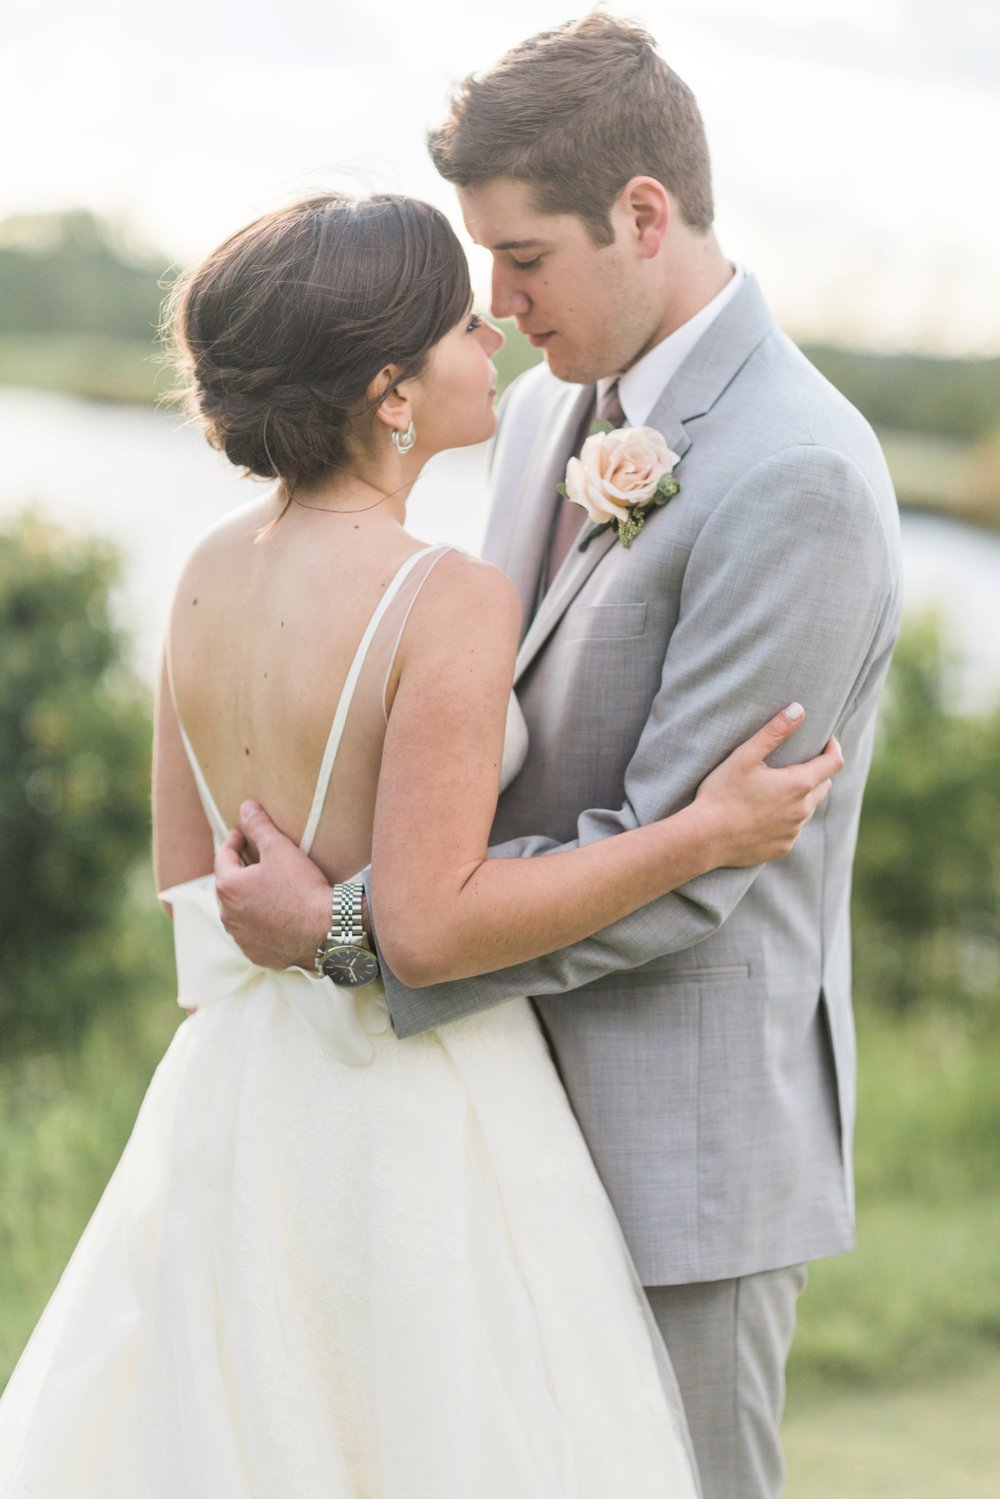 ivy-hills-country-club-weddings-cincinnati-ohio-chloe-luka-photography_9890.jpg